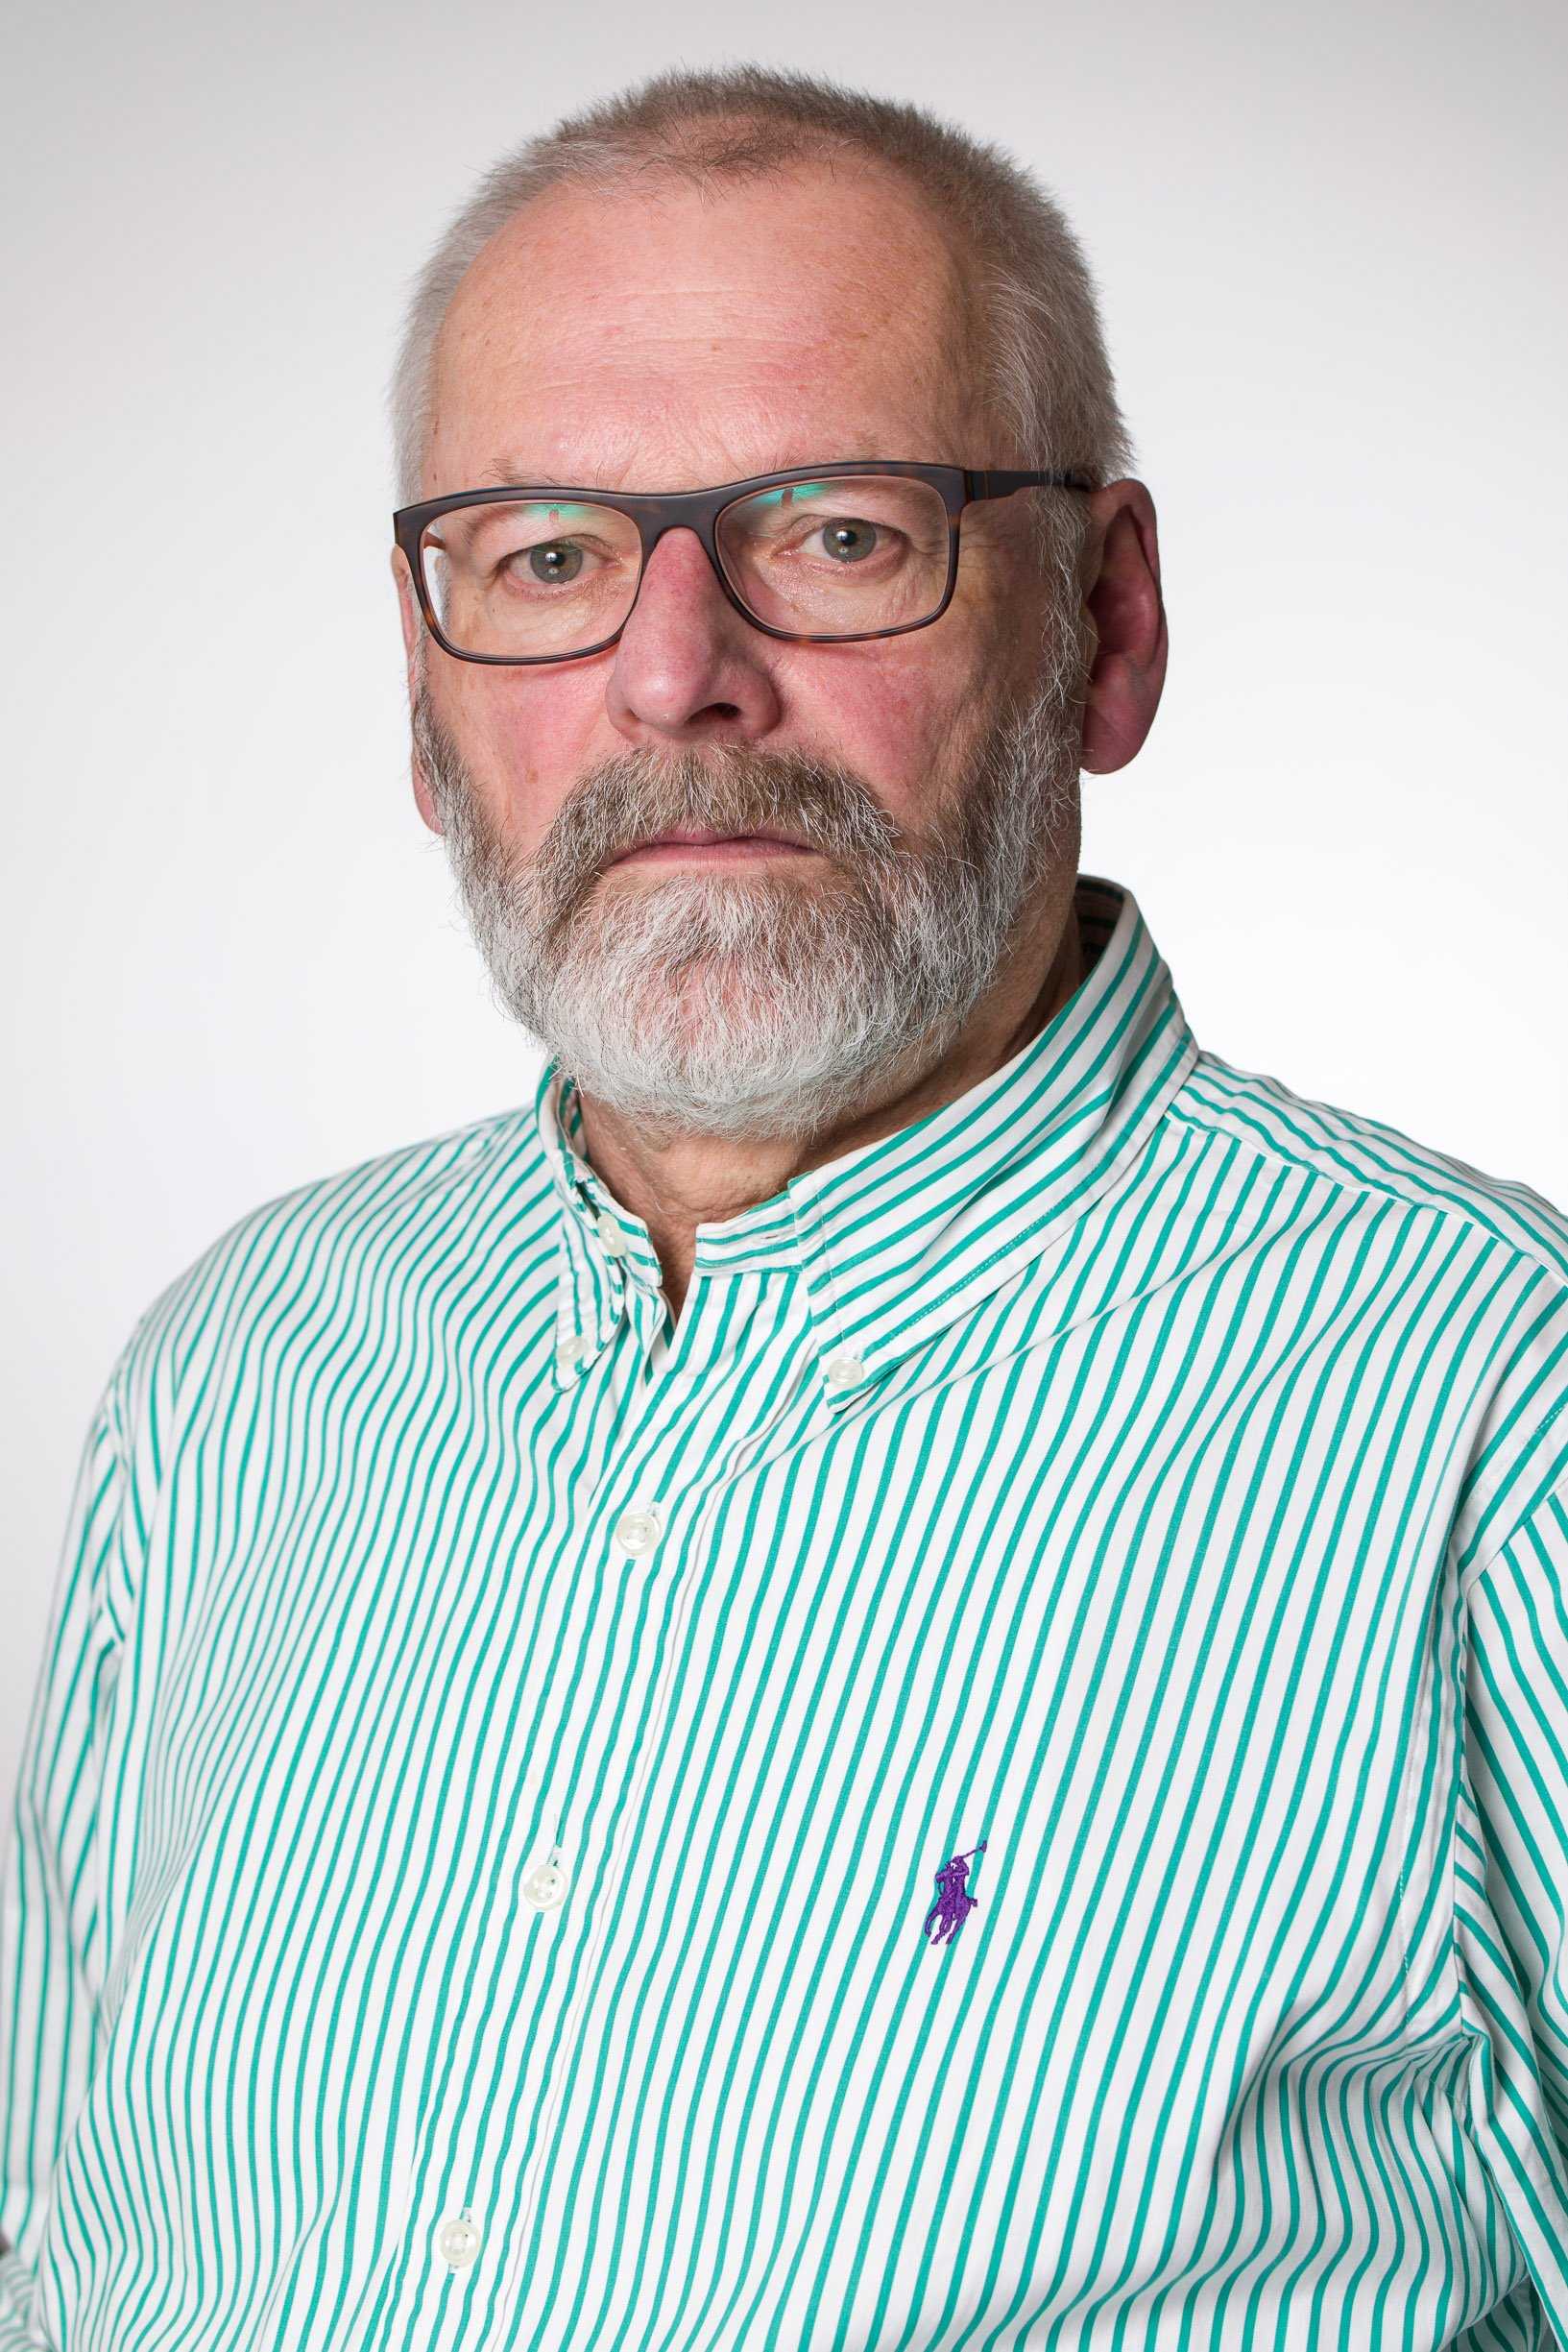 Carlo Riegert